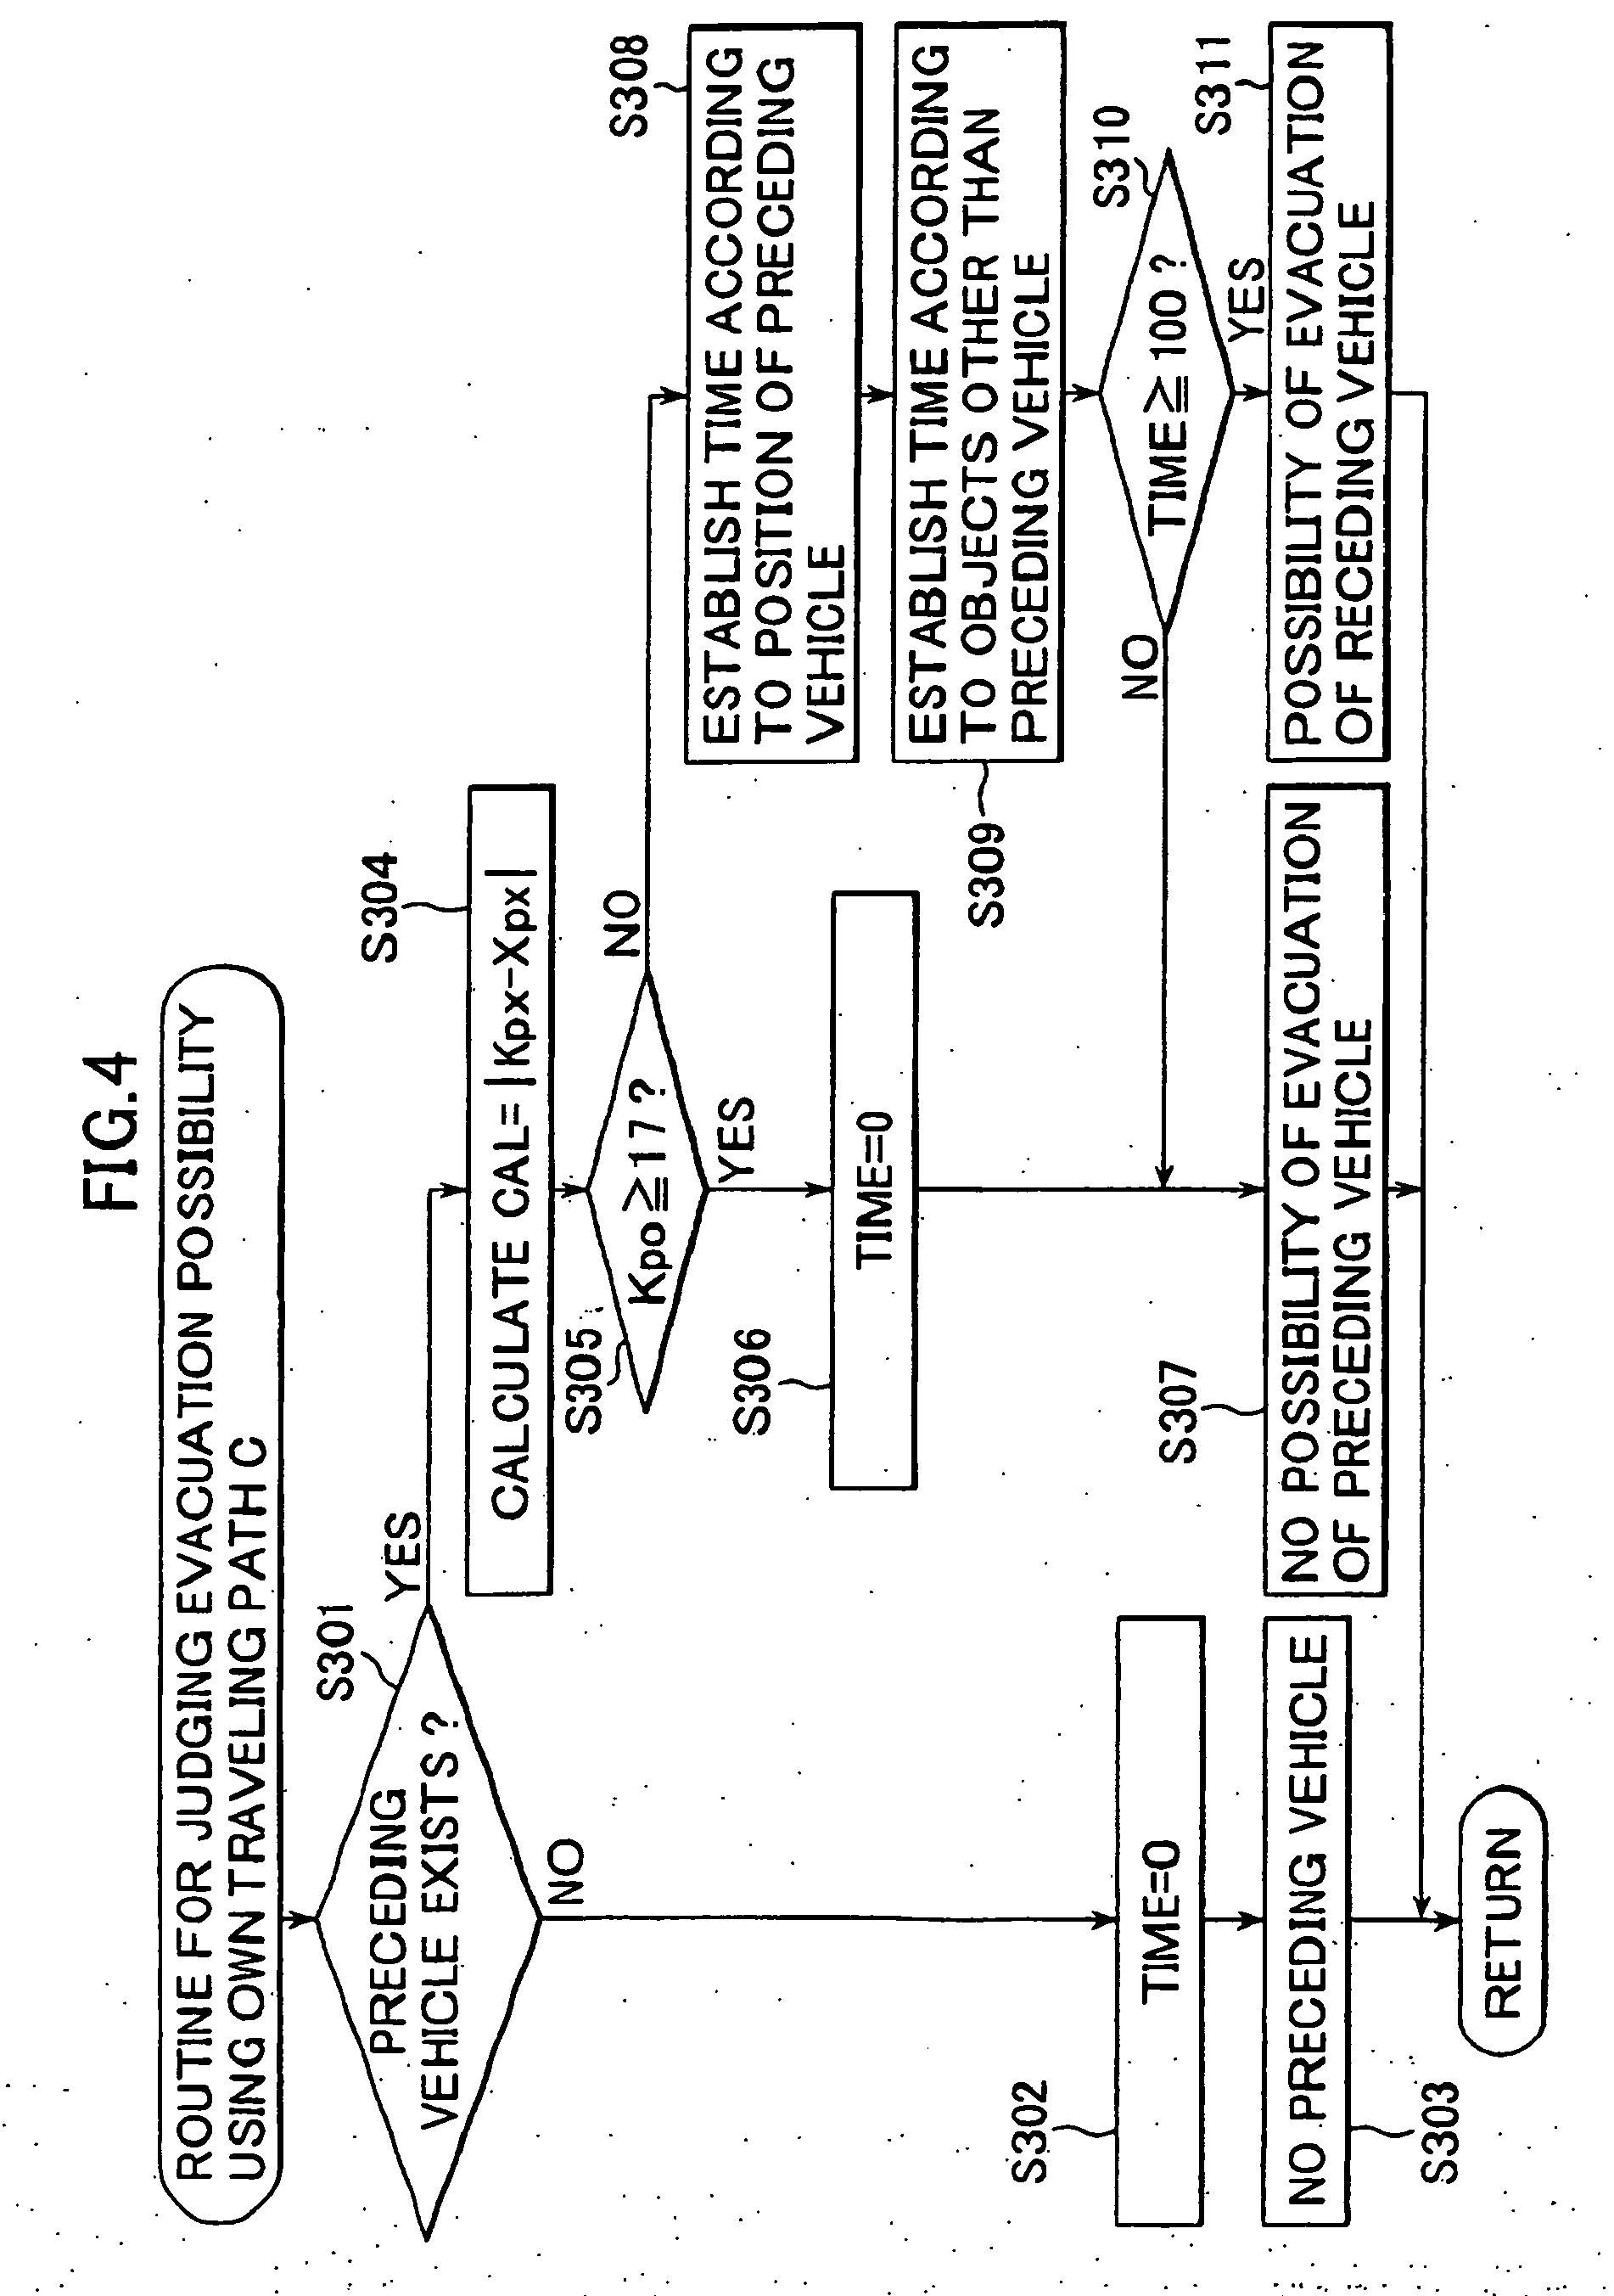 专利ep1407915b1 - vehicle